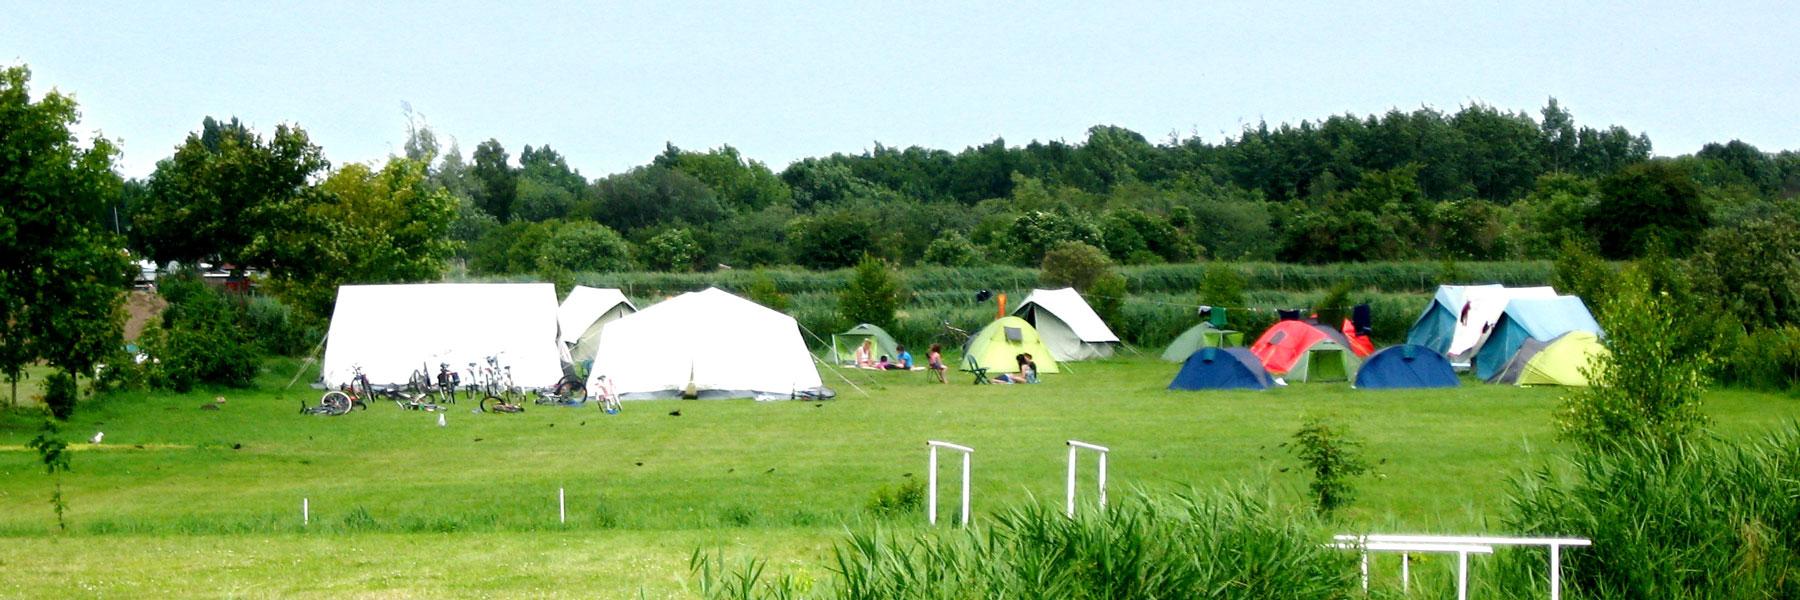 Zeltwiese - Campingplatz Leuchtturm